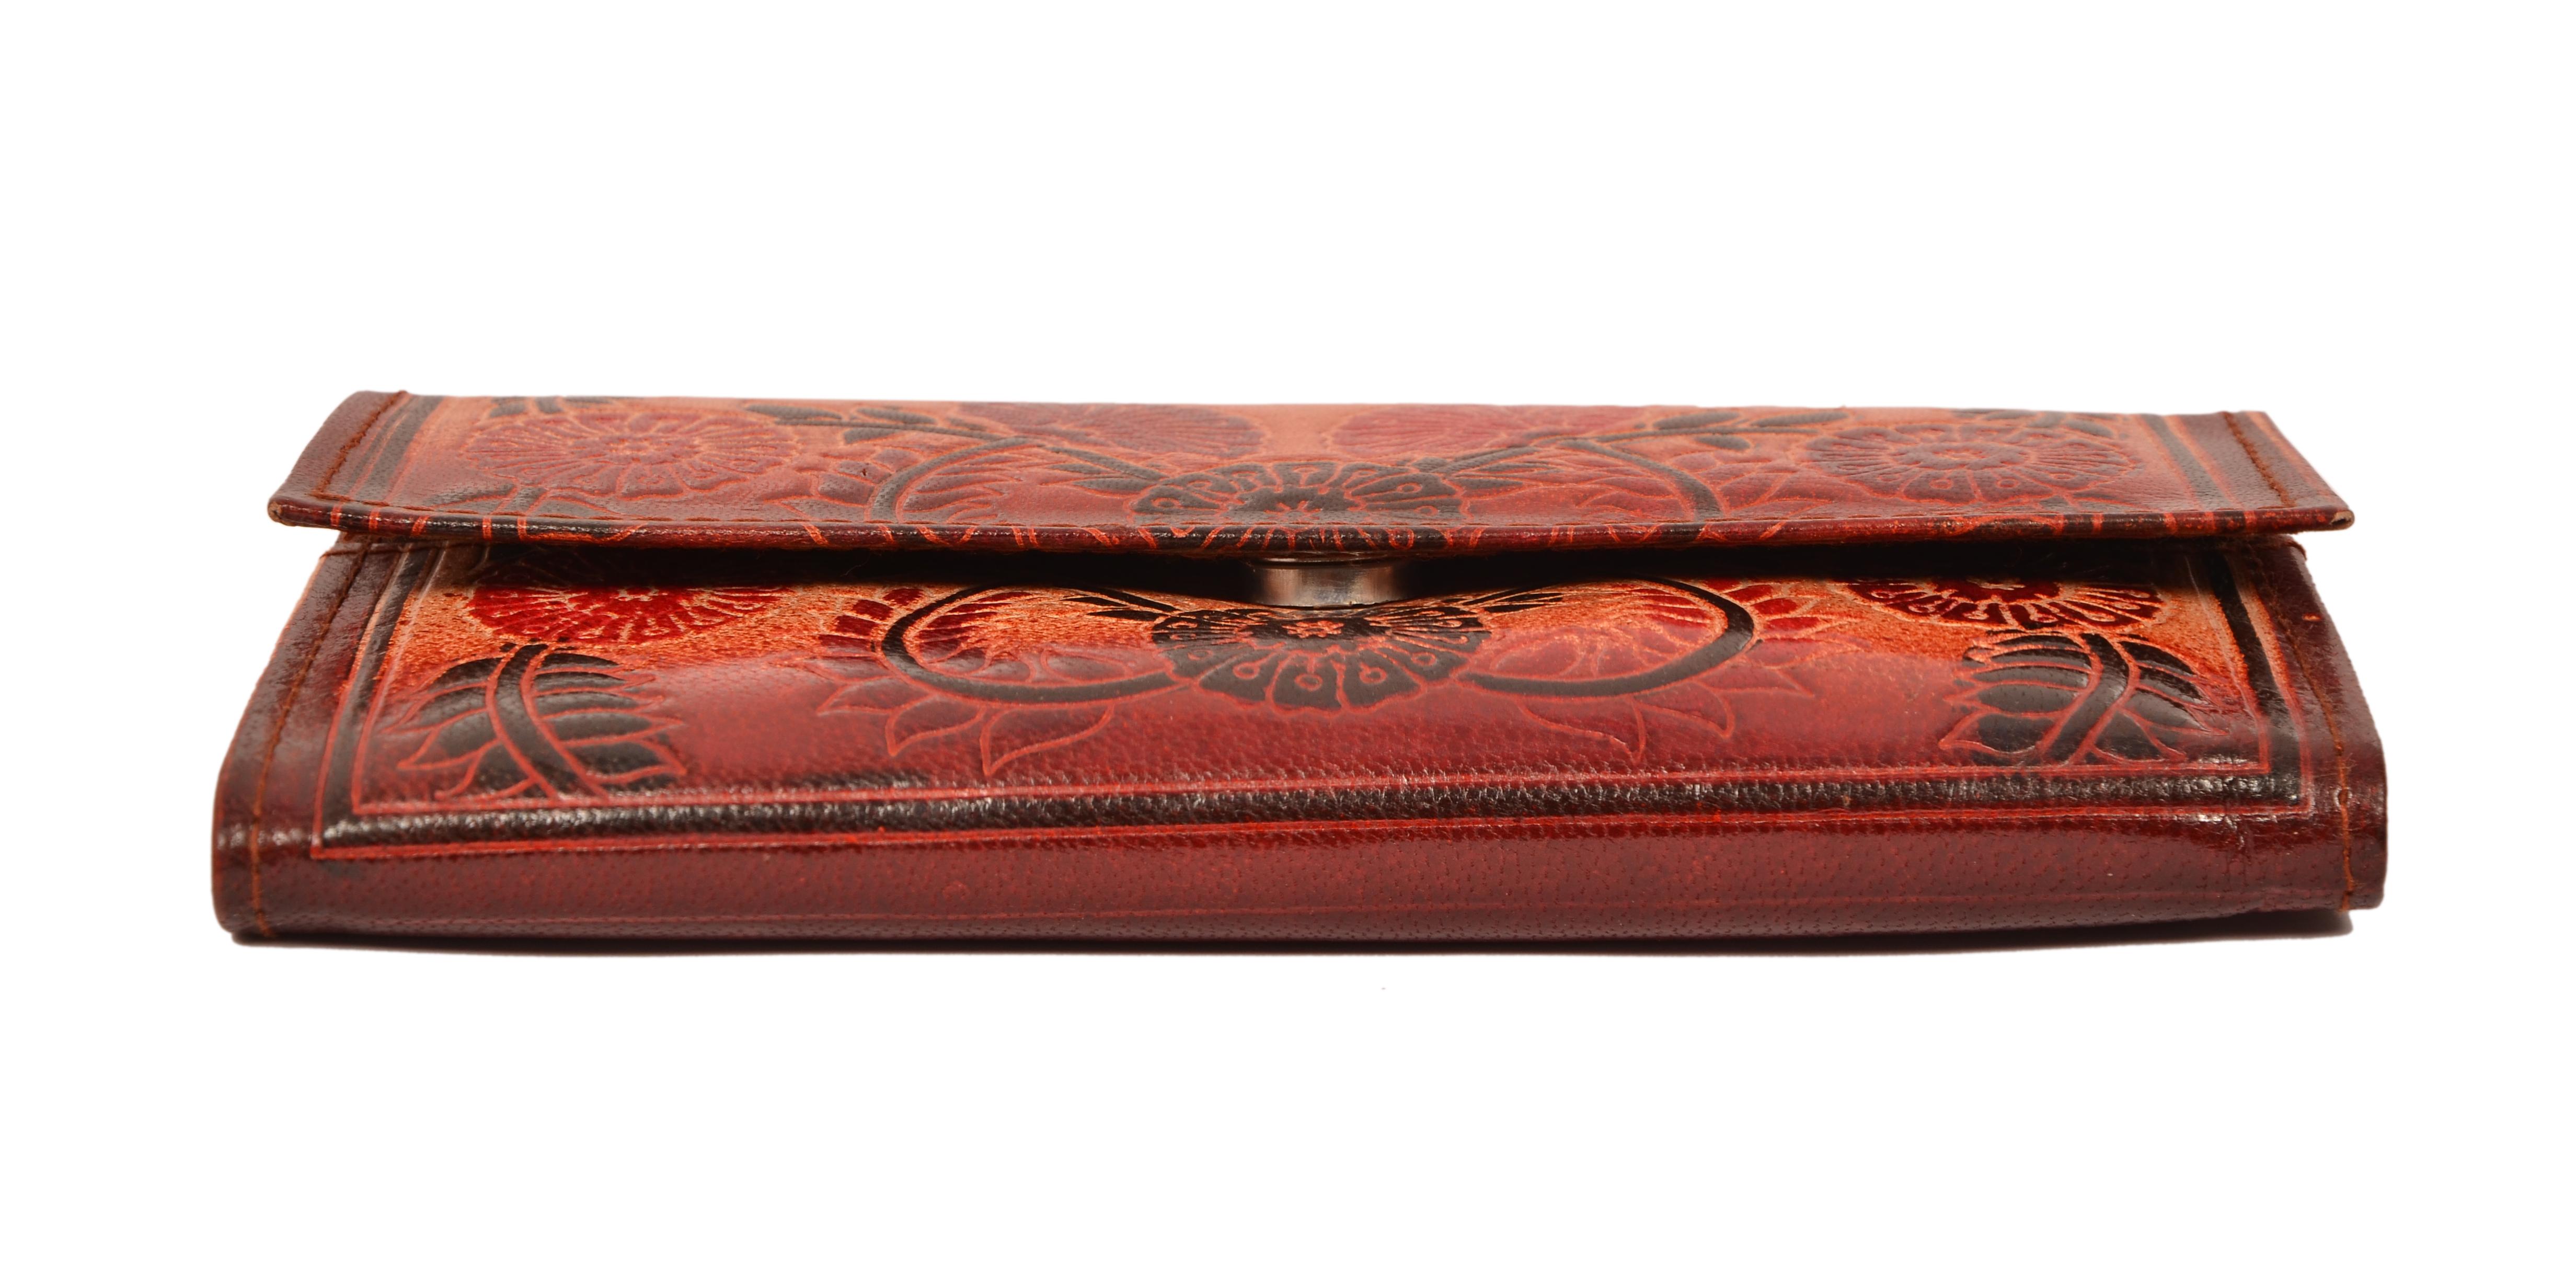 Zint Shantiniketan Pure Leather Floral Design Women S